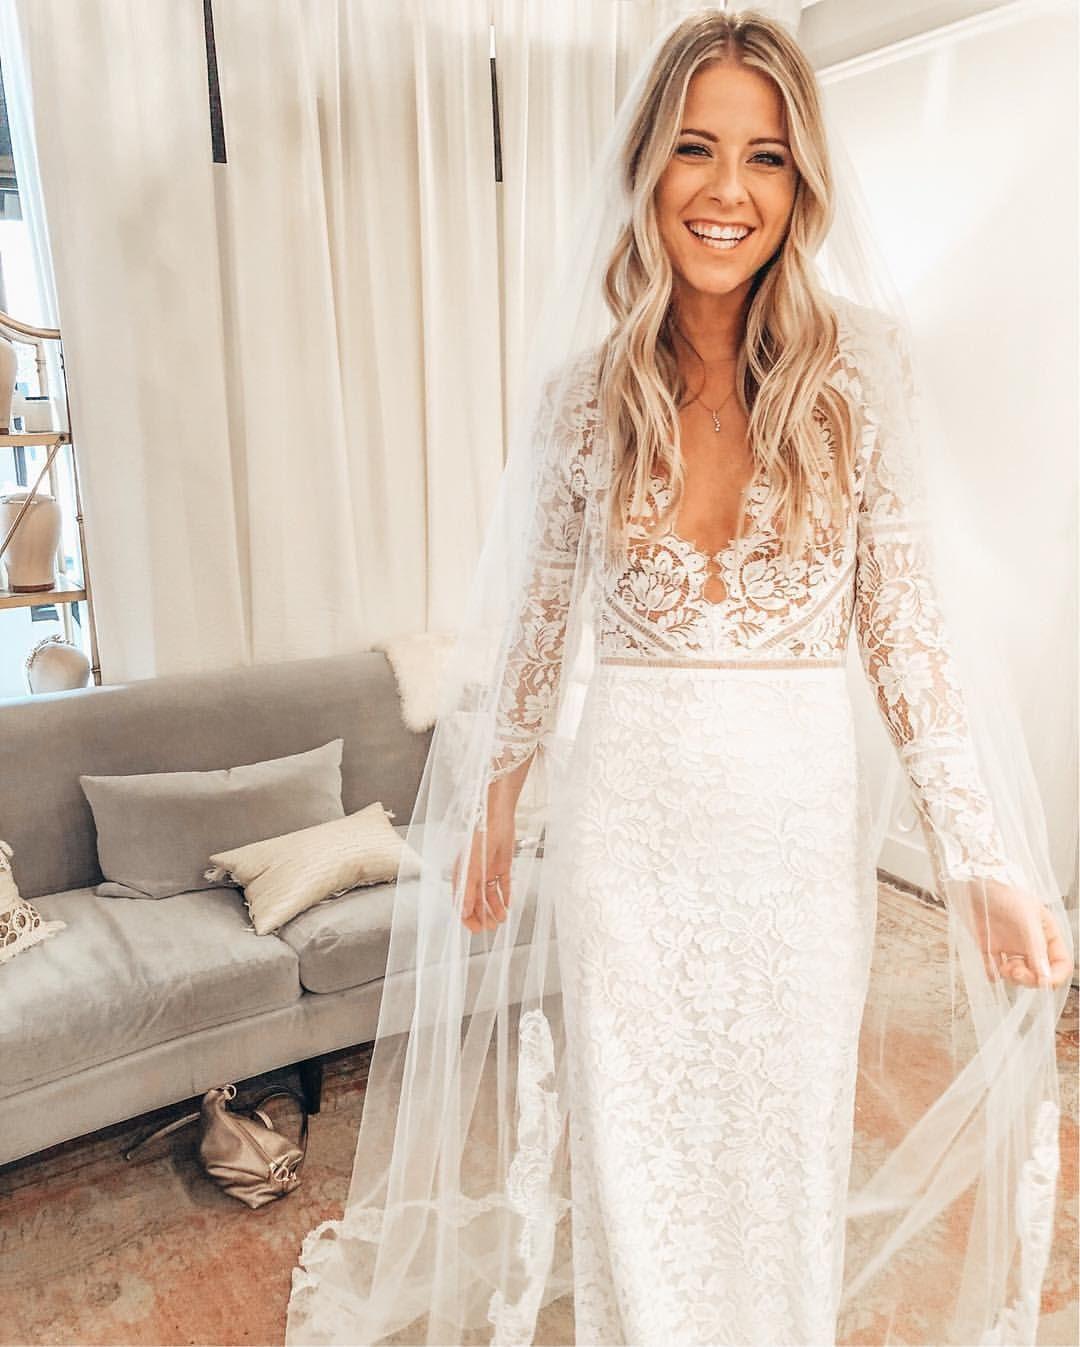 Sarah seven wedding dress boho lace wedding dress with sleeves